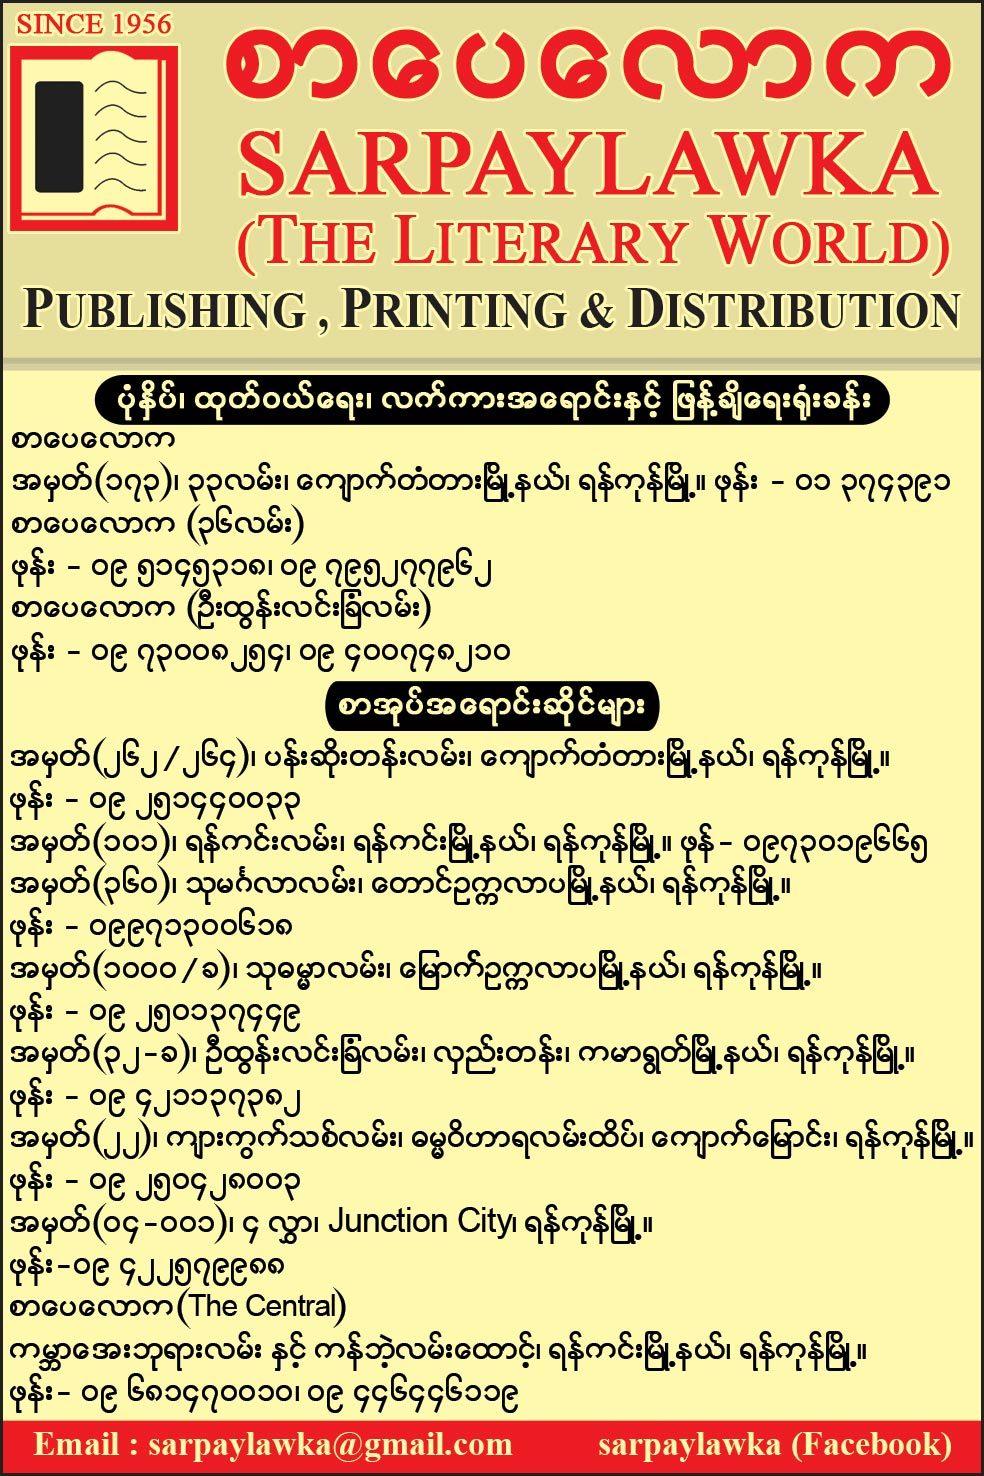 Sar-Pay-Law-Ka_Book-Publishers-&-Distributors_(B)_1991.jpg